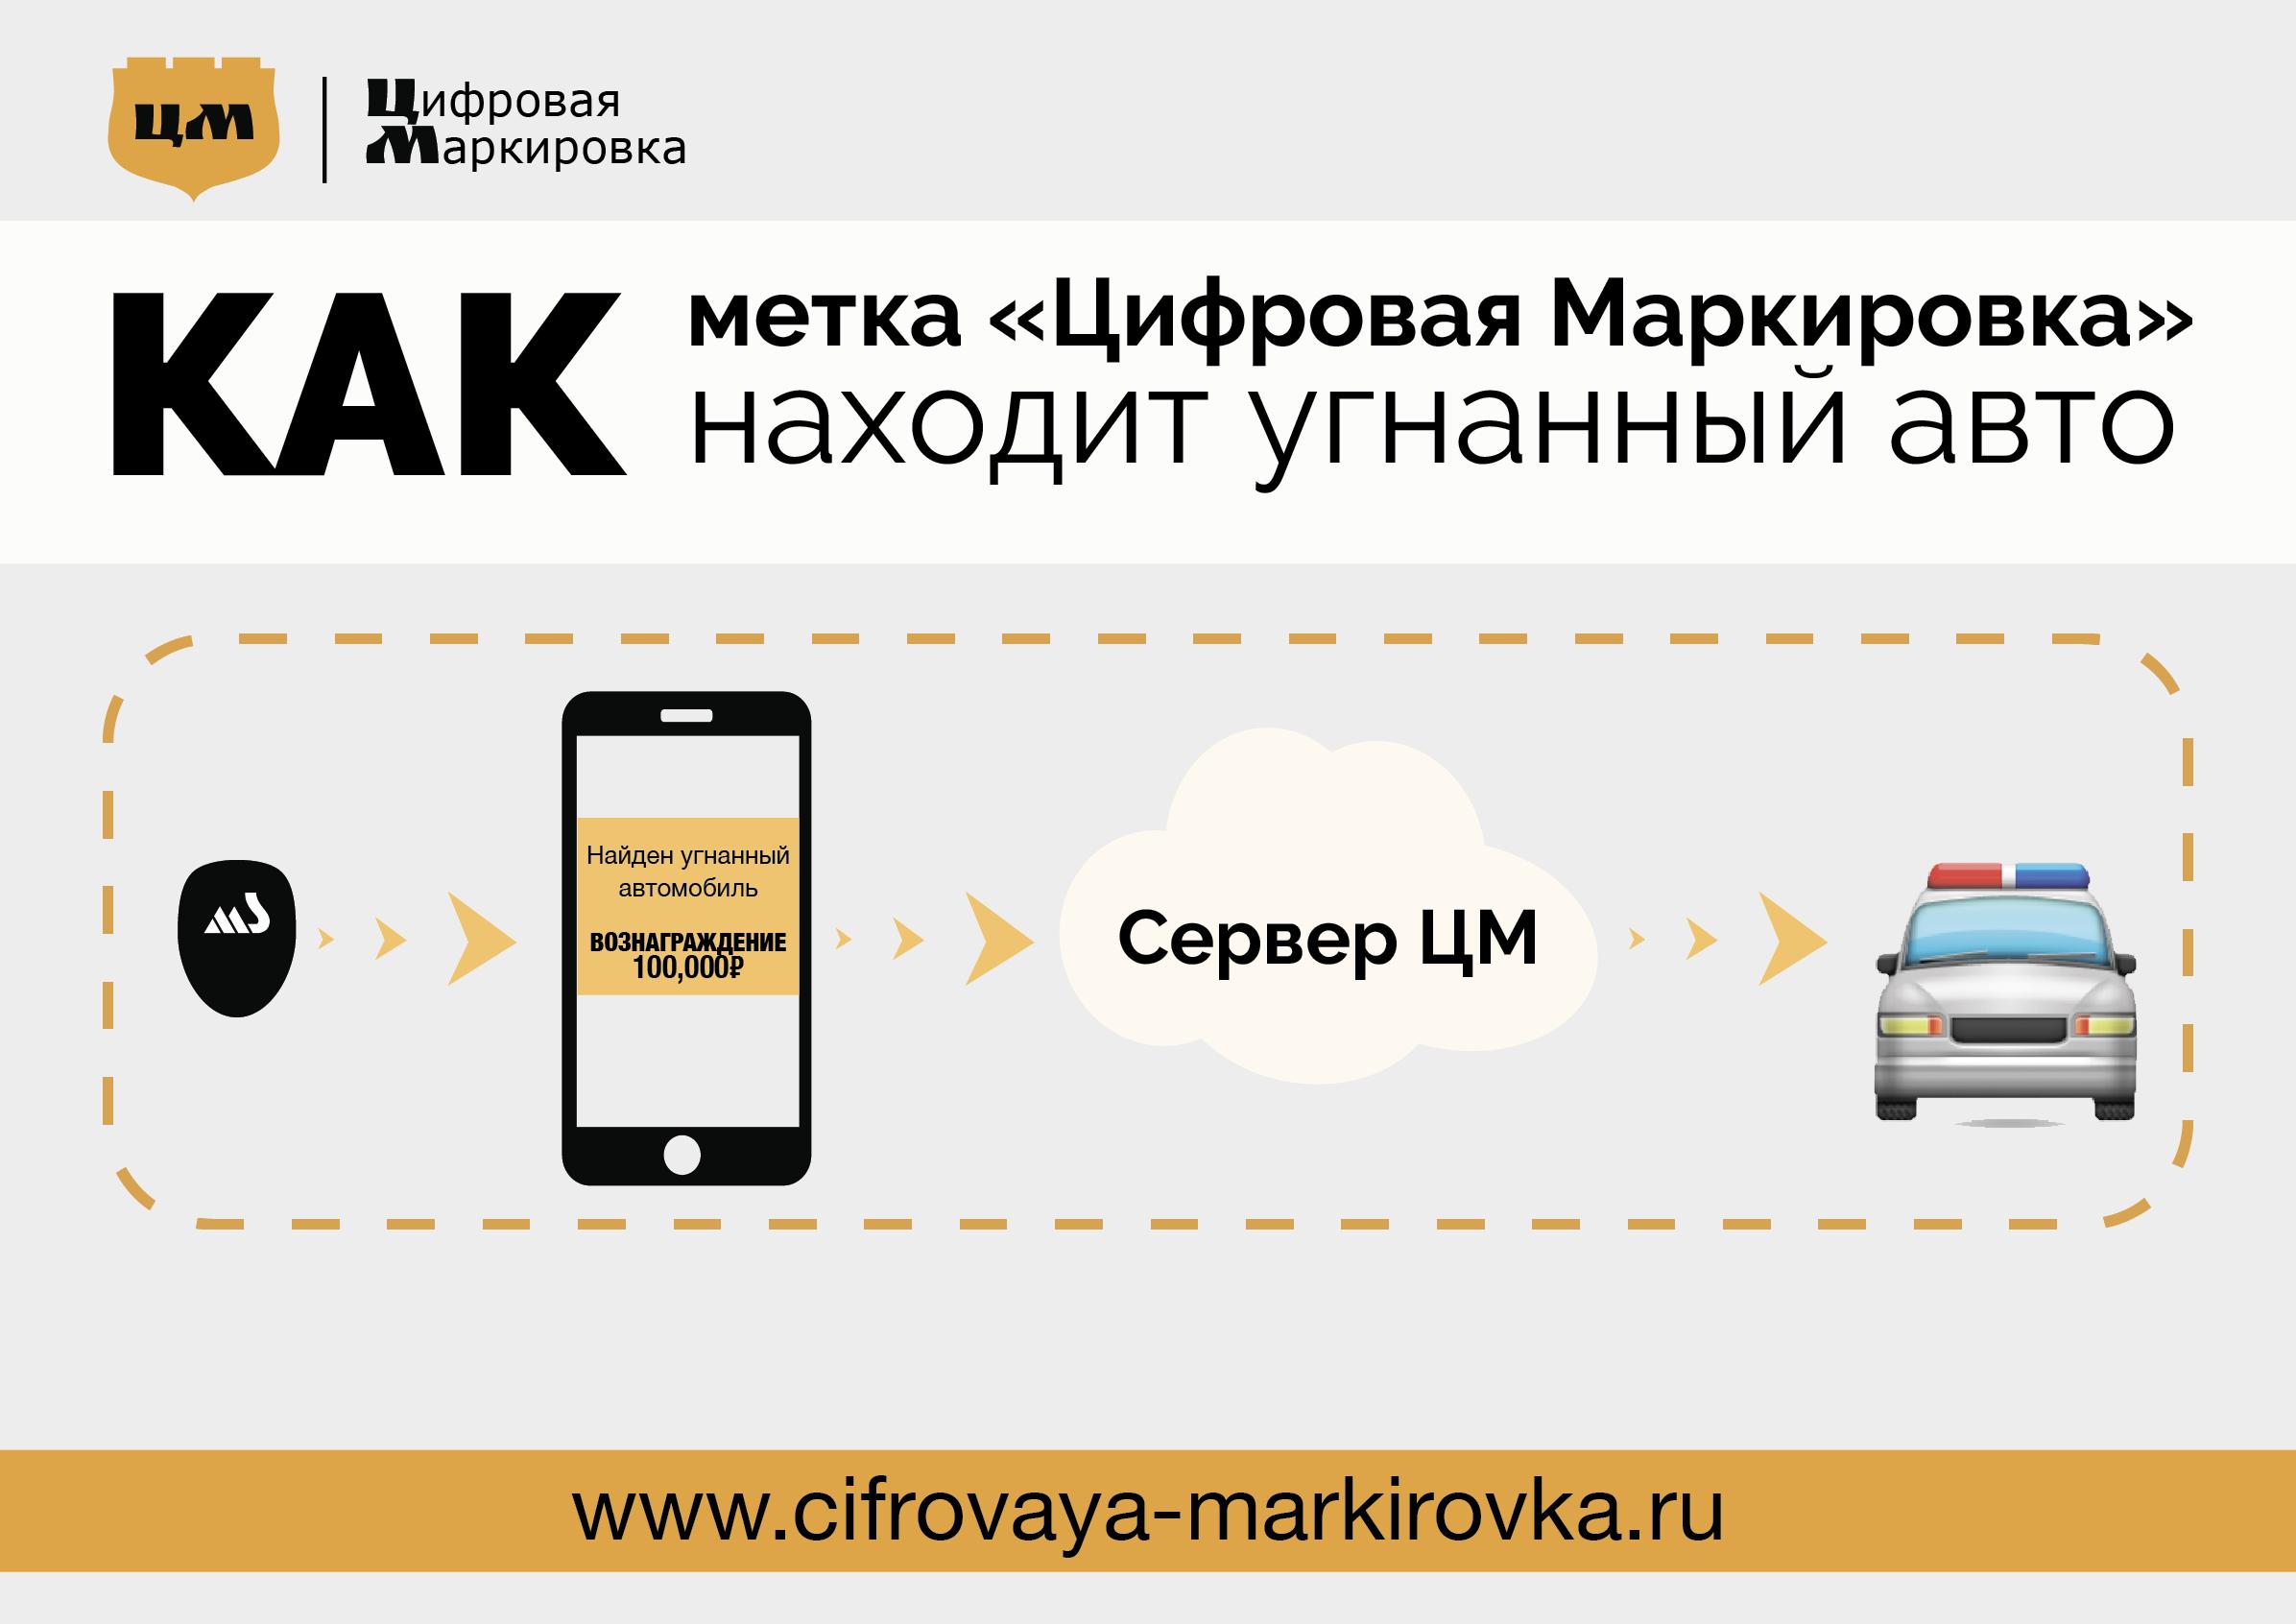 cifrovaya-markirovka-8